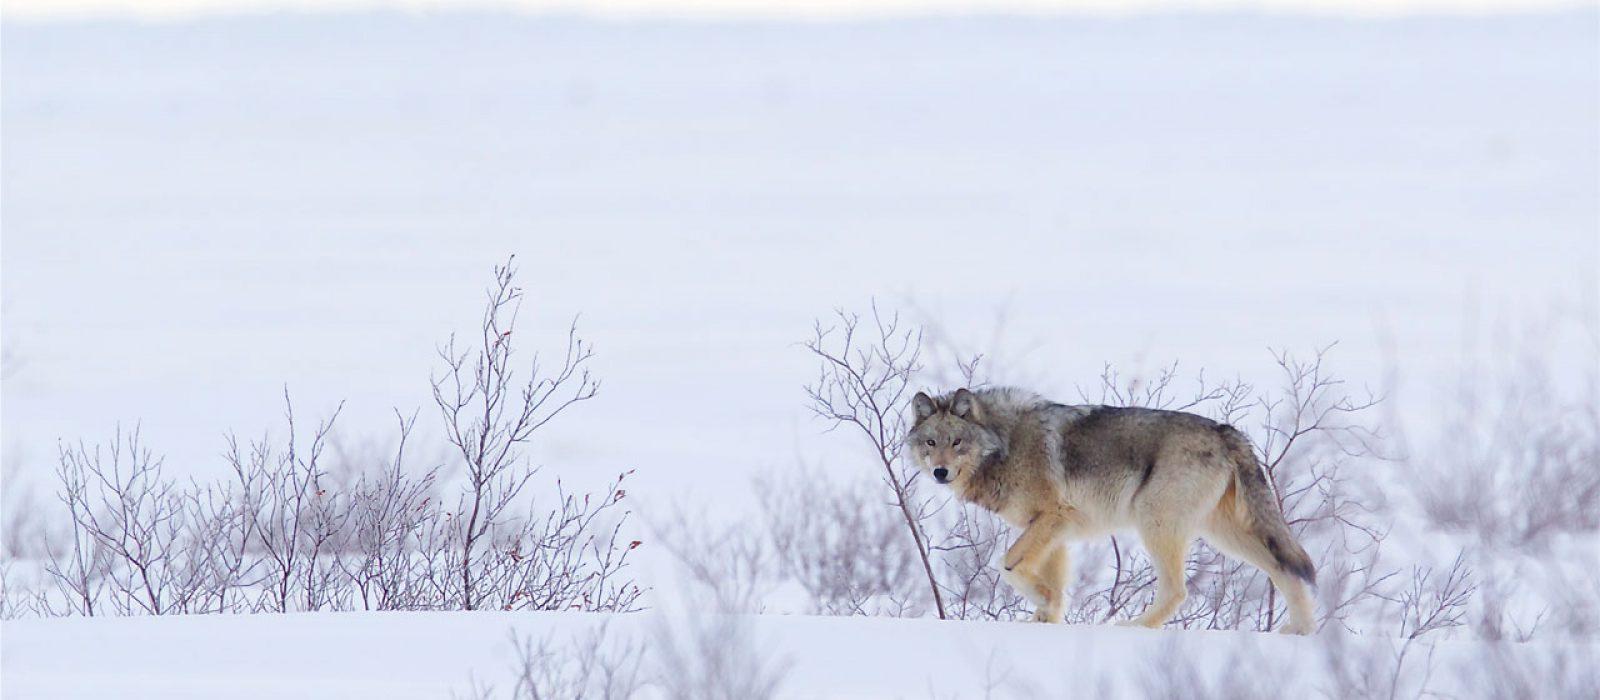 Wolf at Churchill Wild, Manitoba